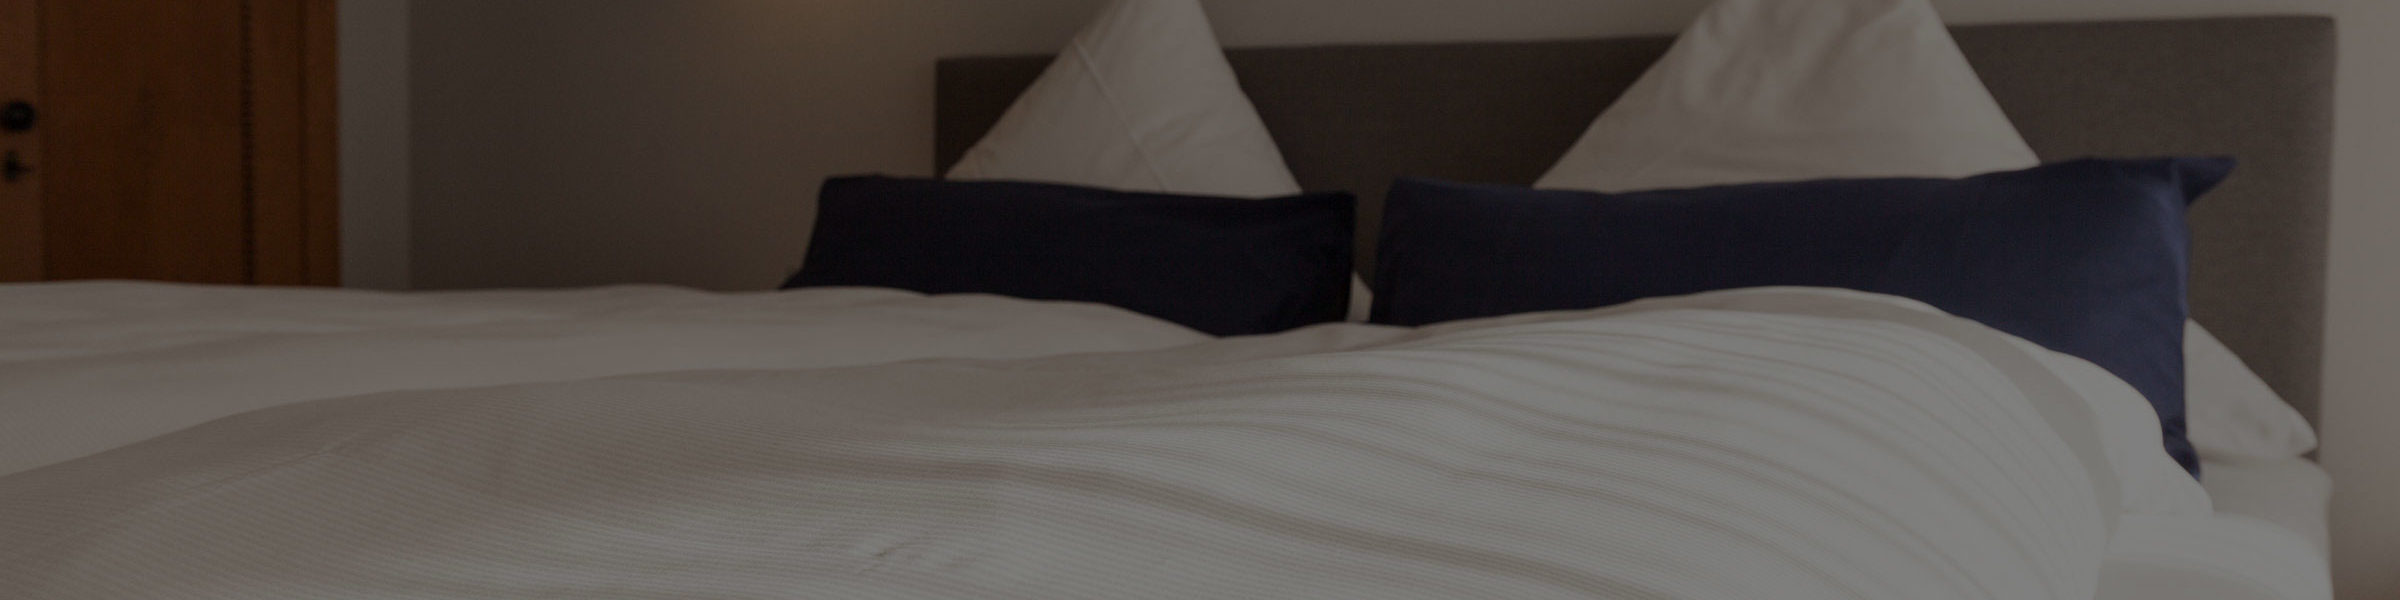 Hotel Fiori in Bad Soden-Salmünster